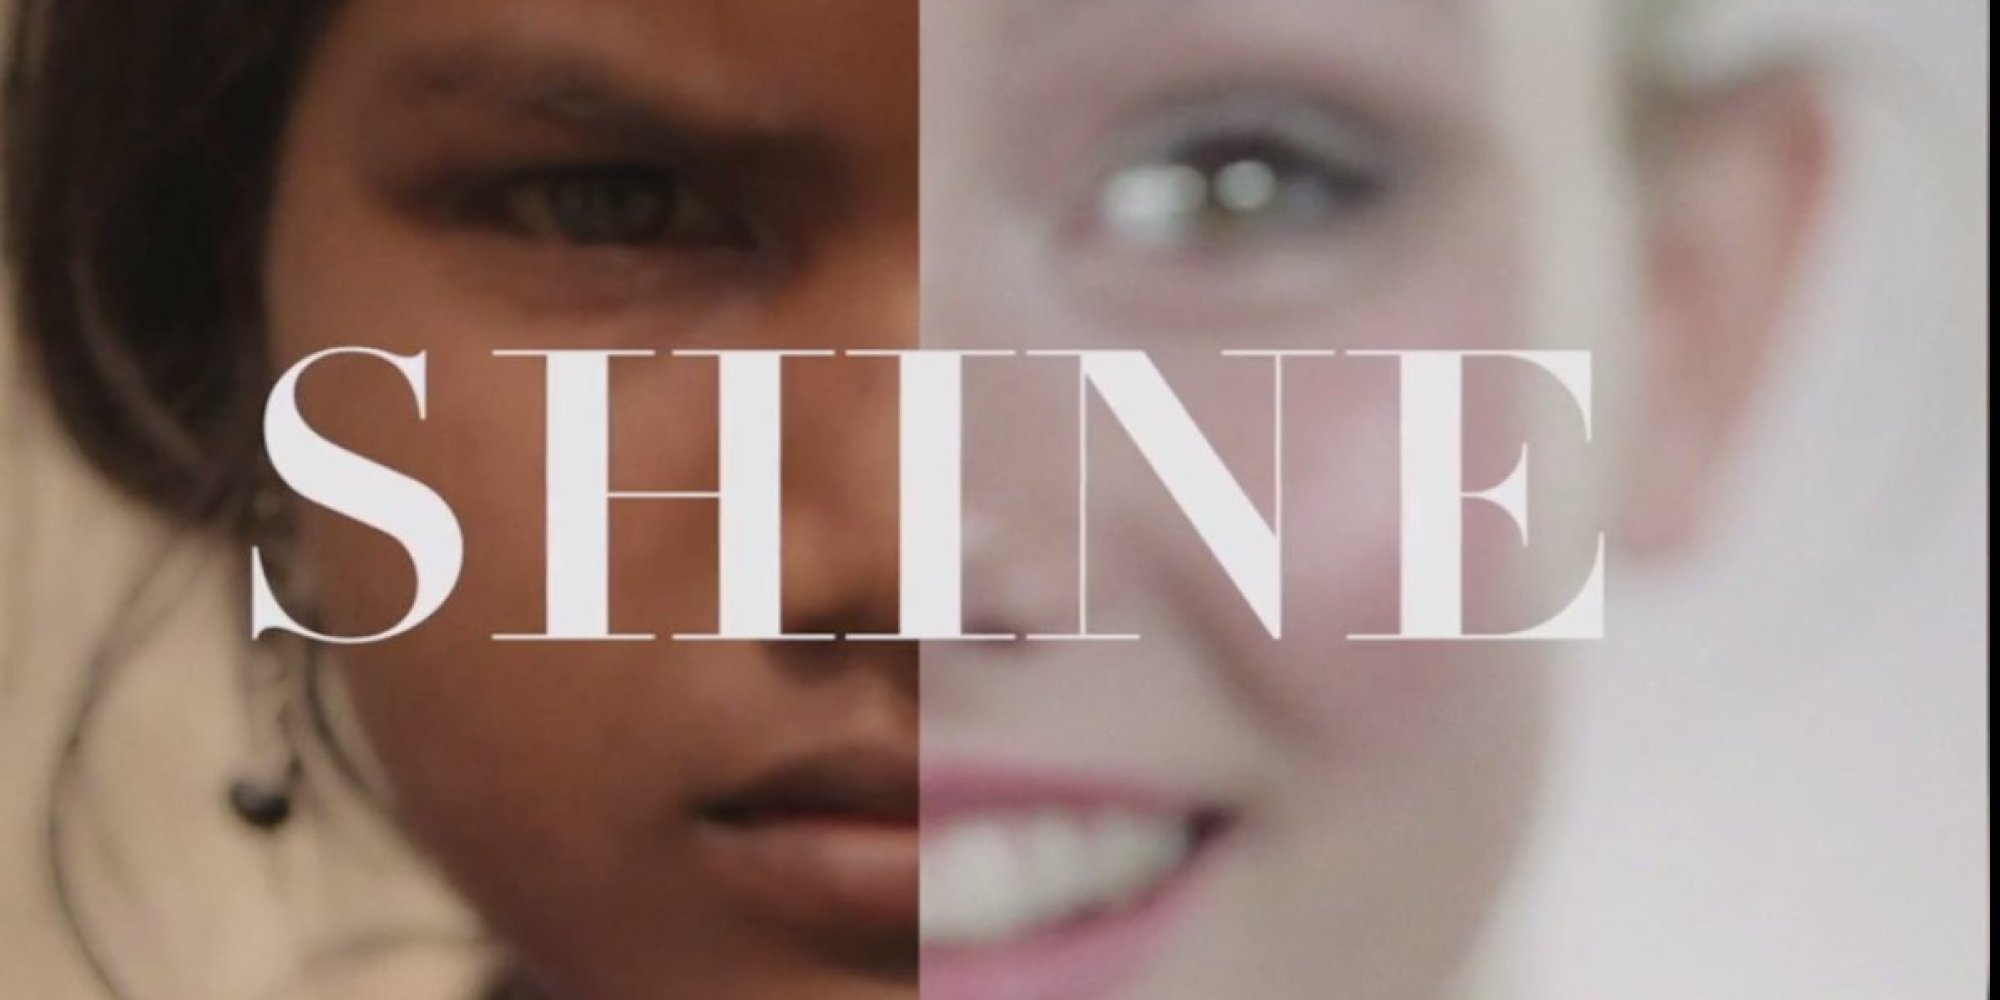 child-slave-shine